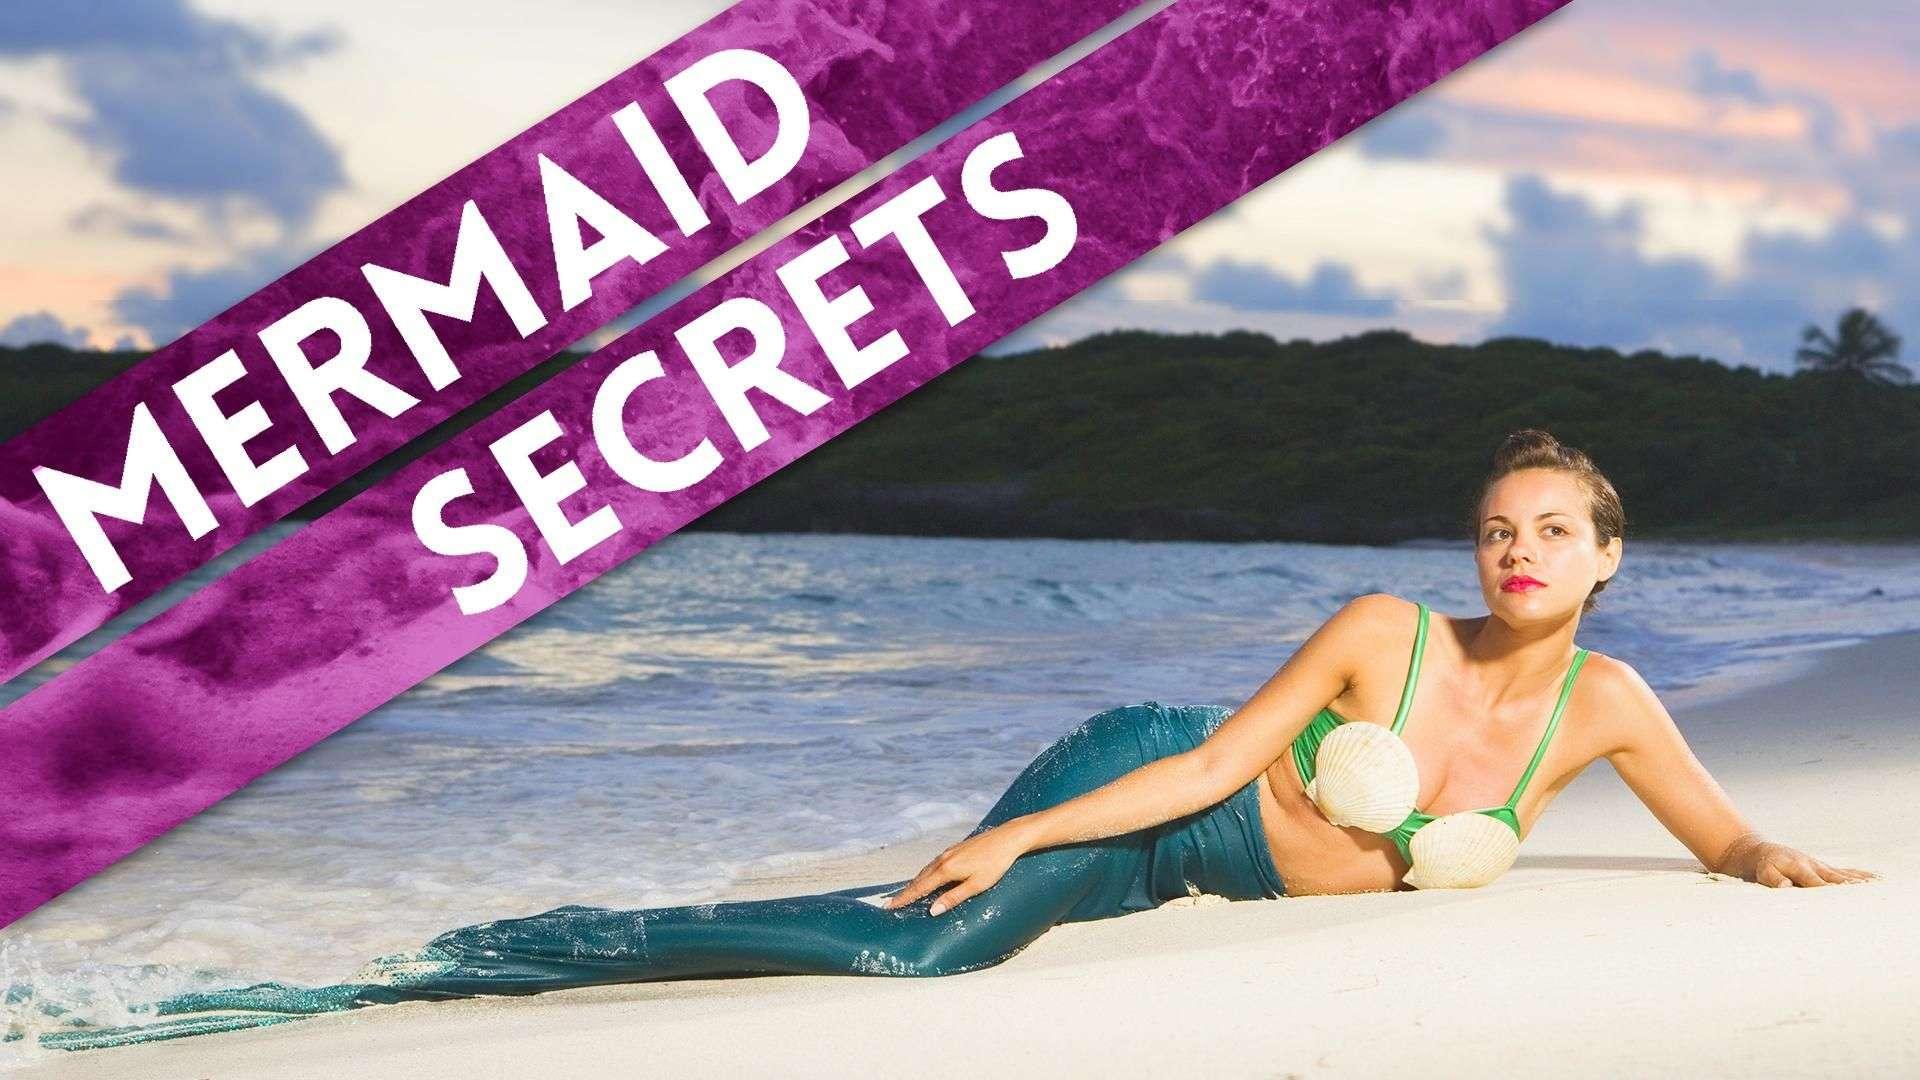 13 Secretos de Whisper de sirenas